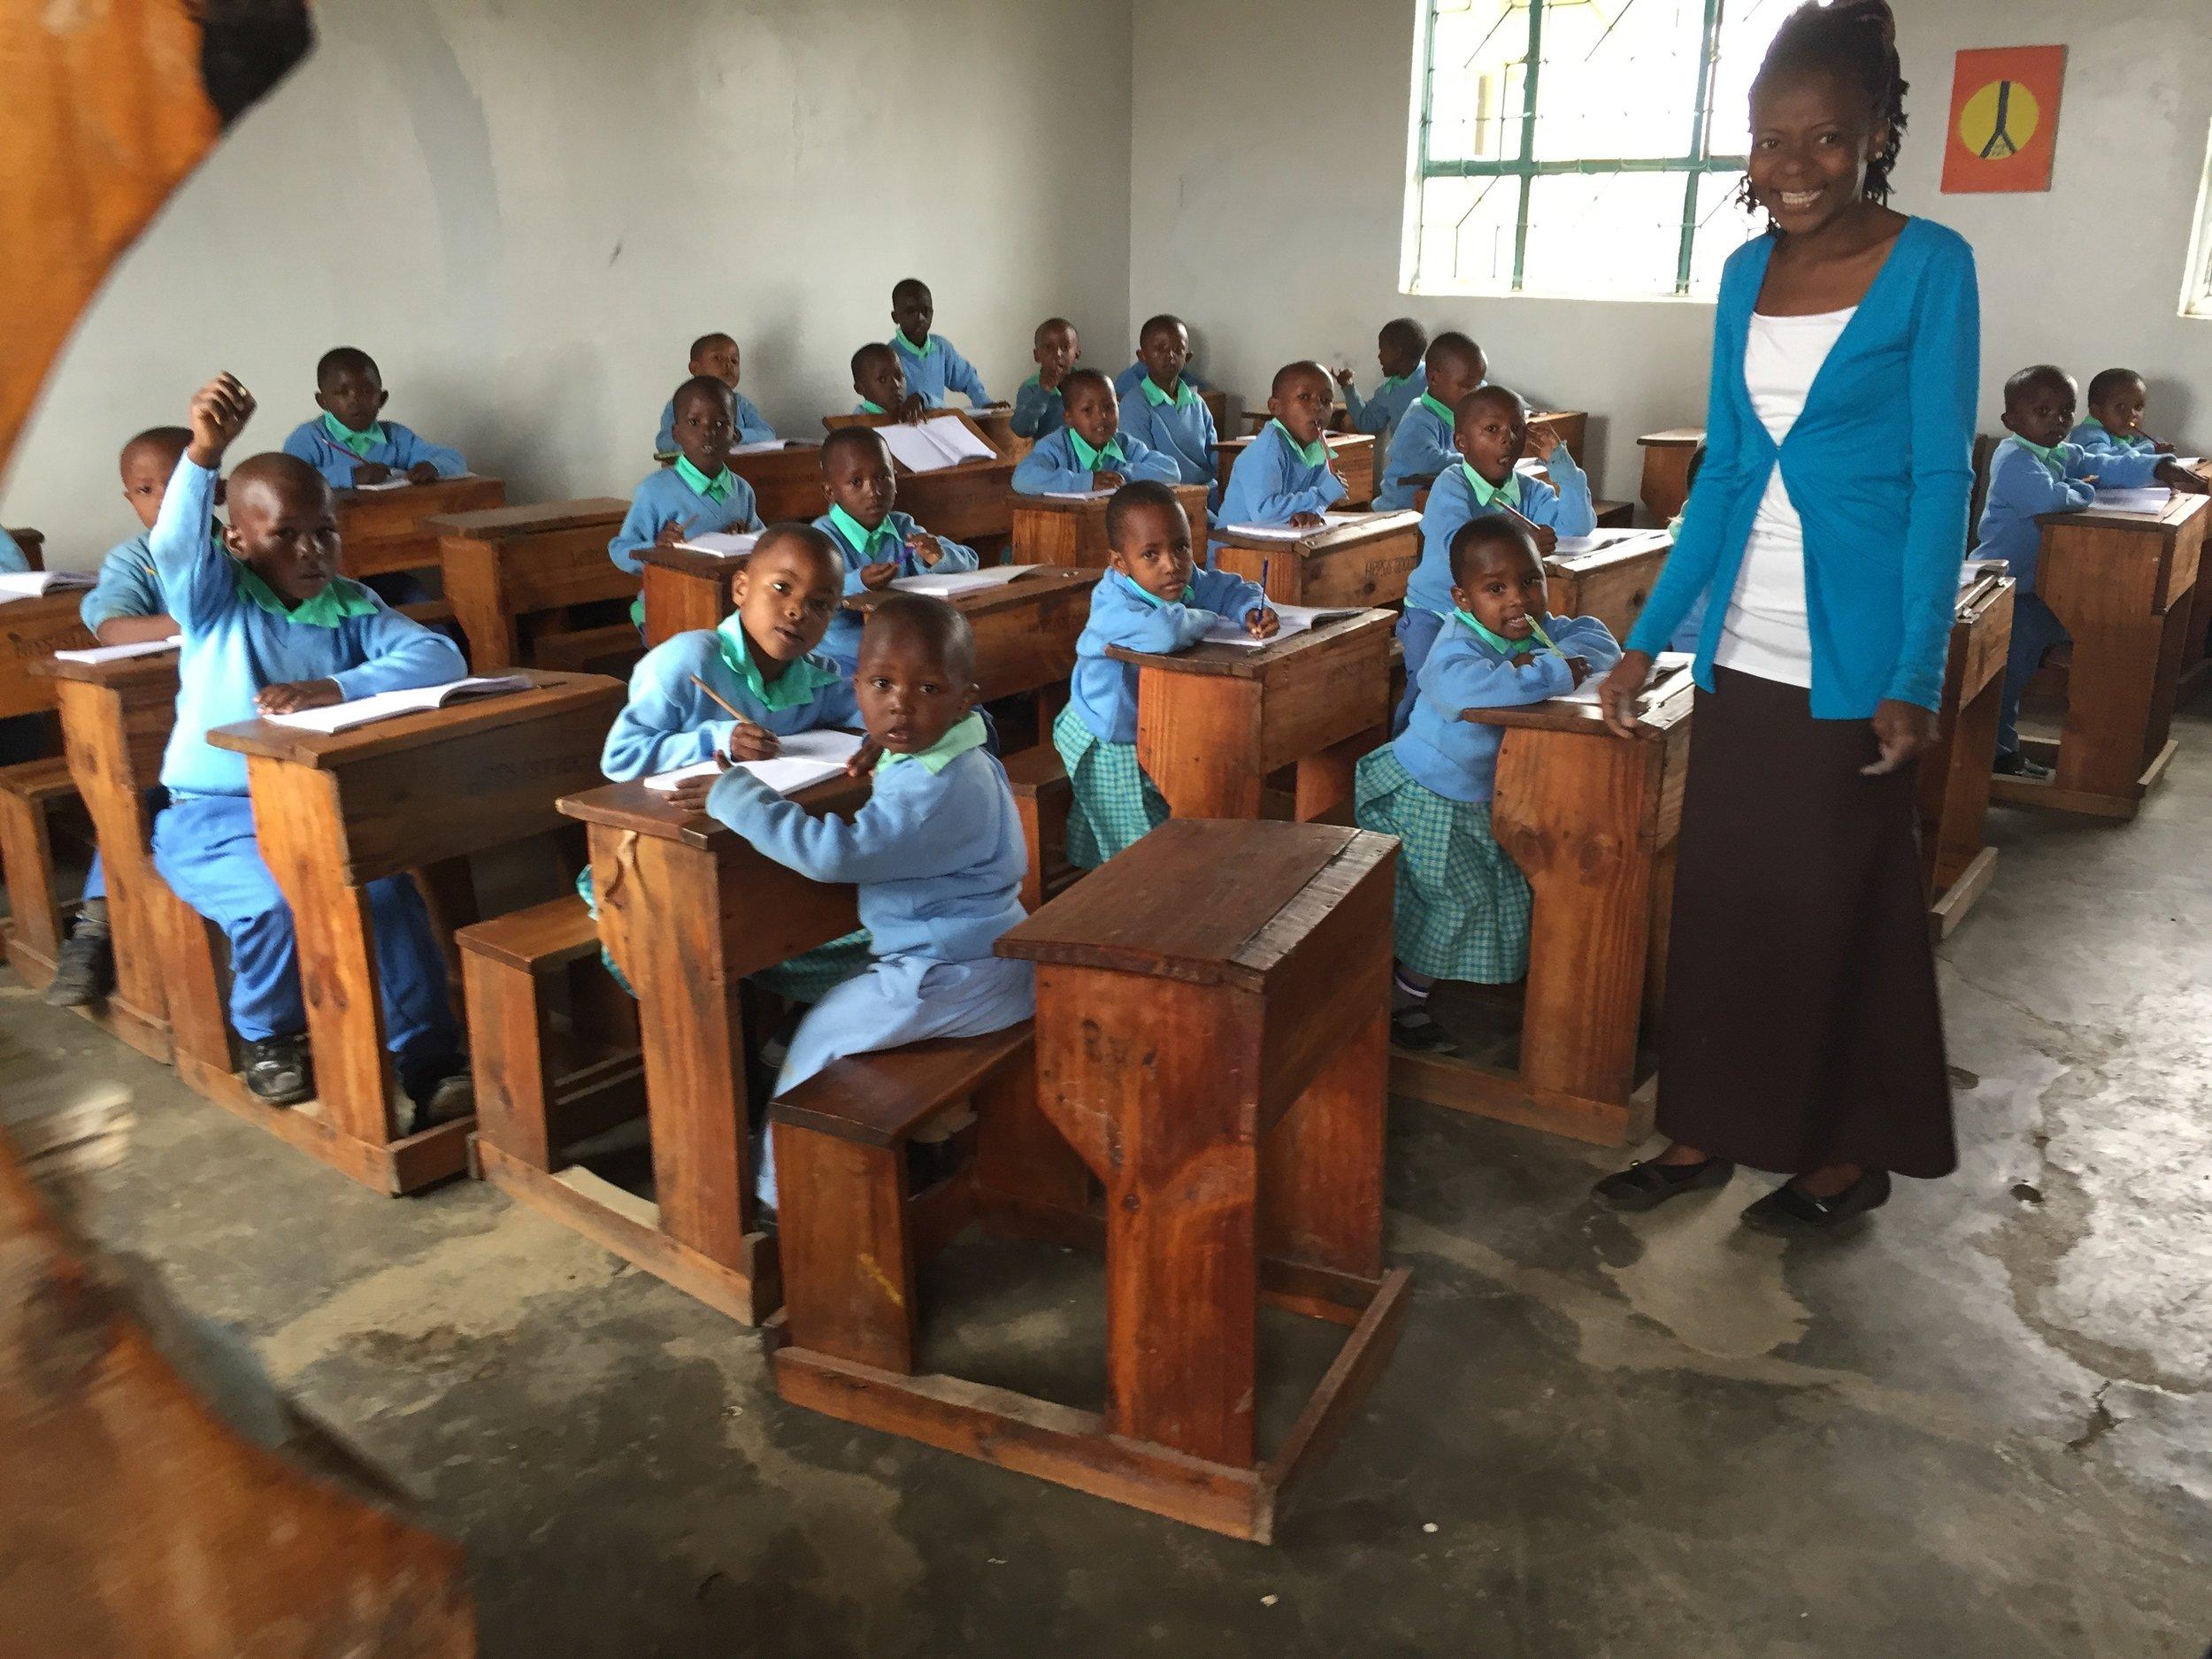 heaven classroom copy.jpg